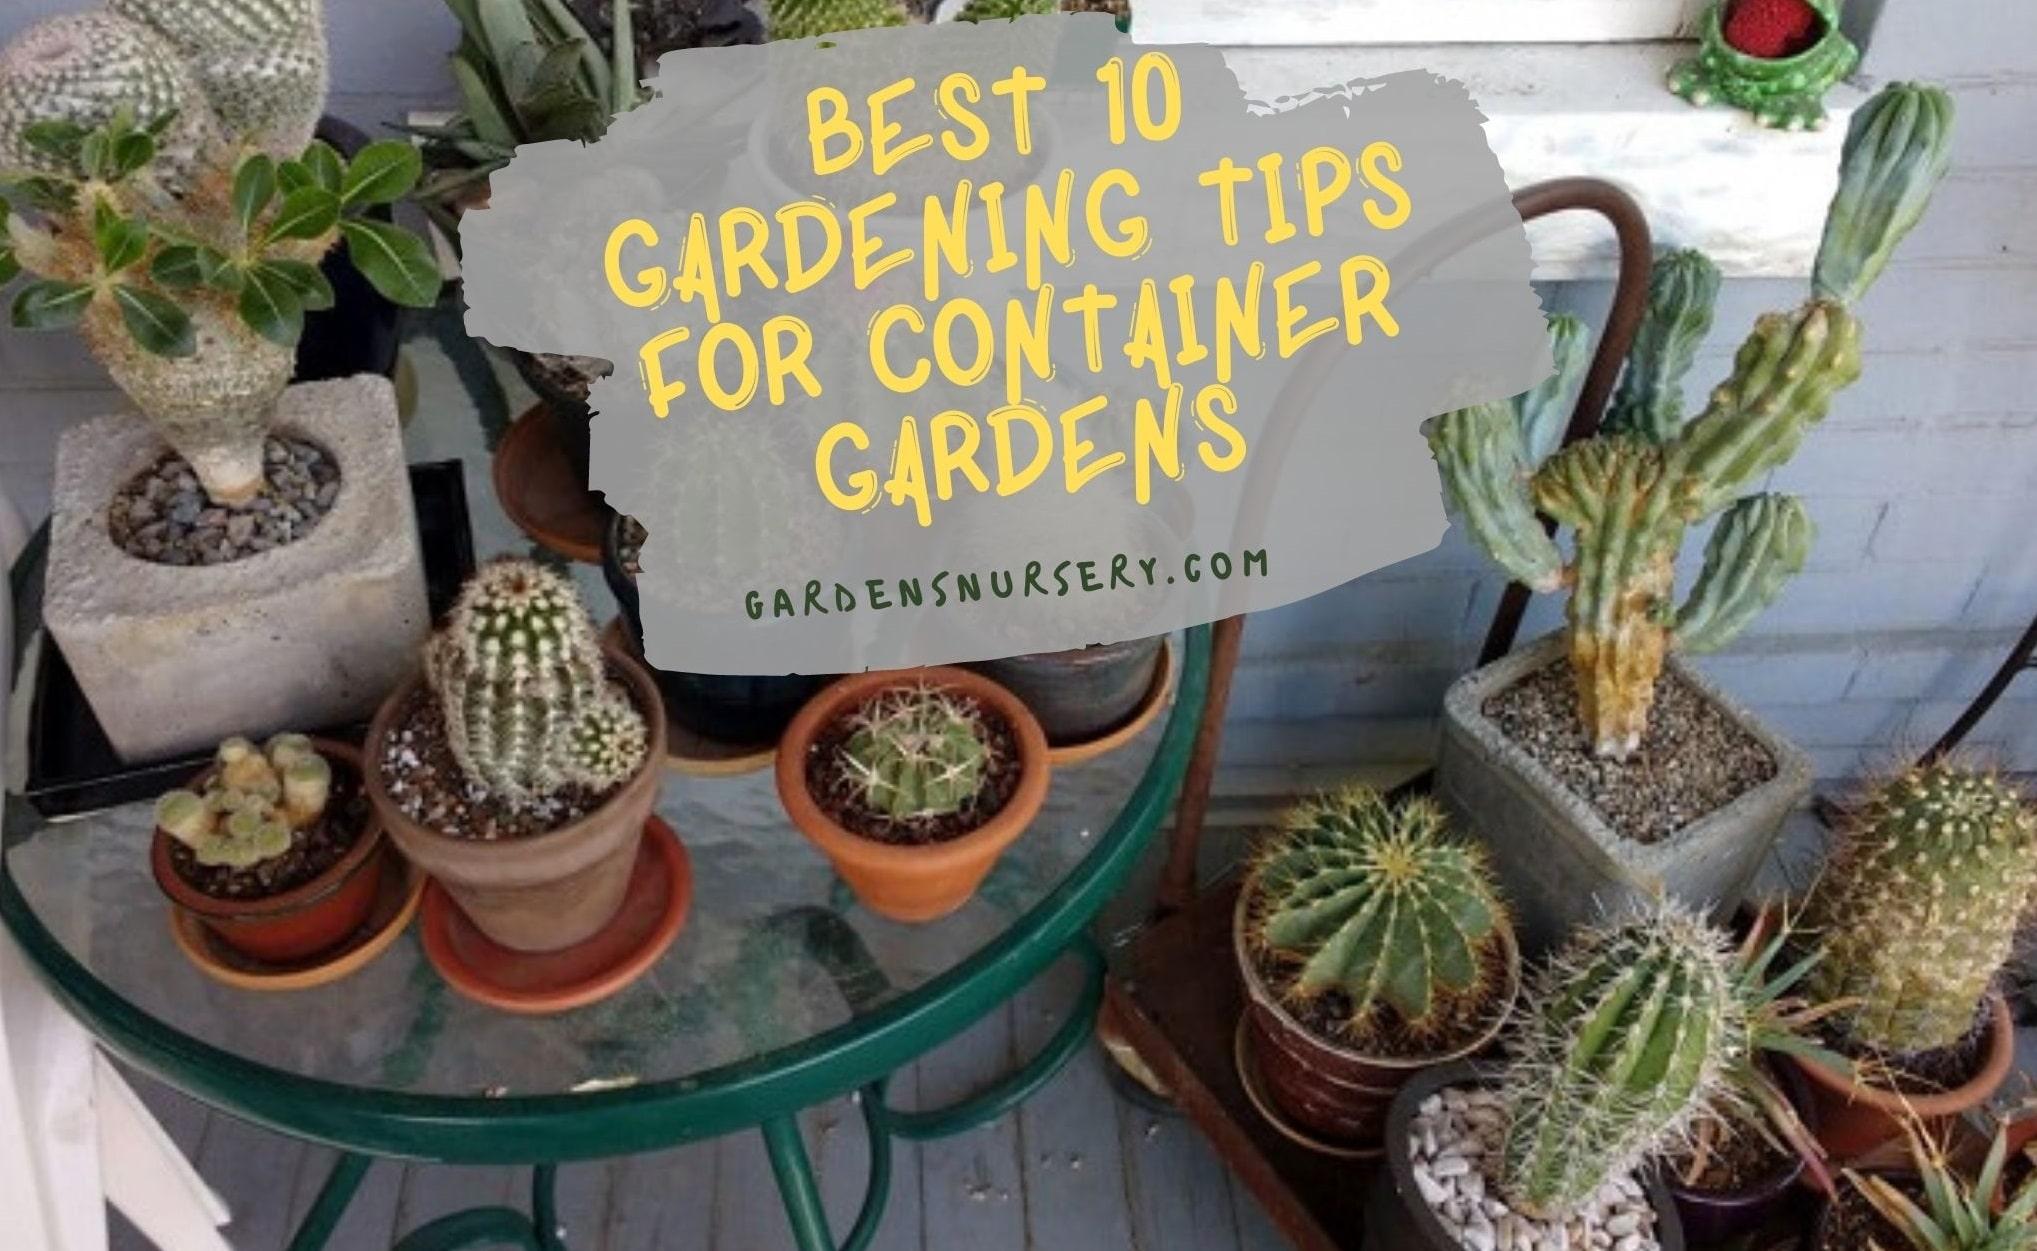 Best 10 Gardening Tips for Container Gardens